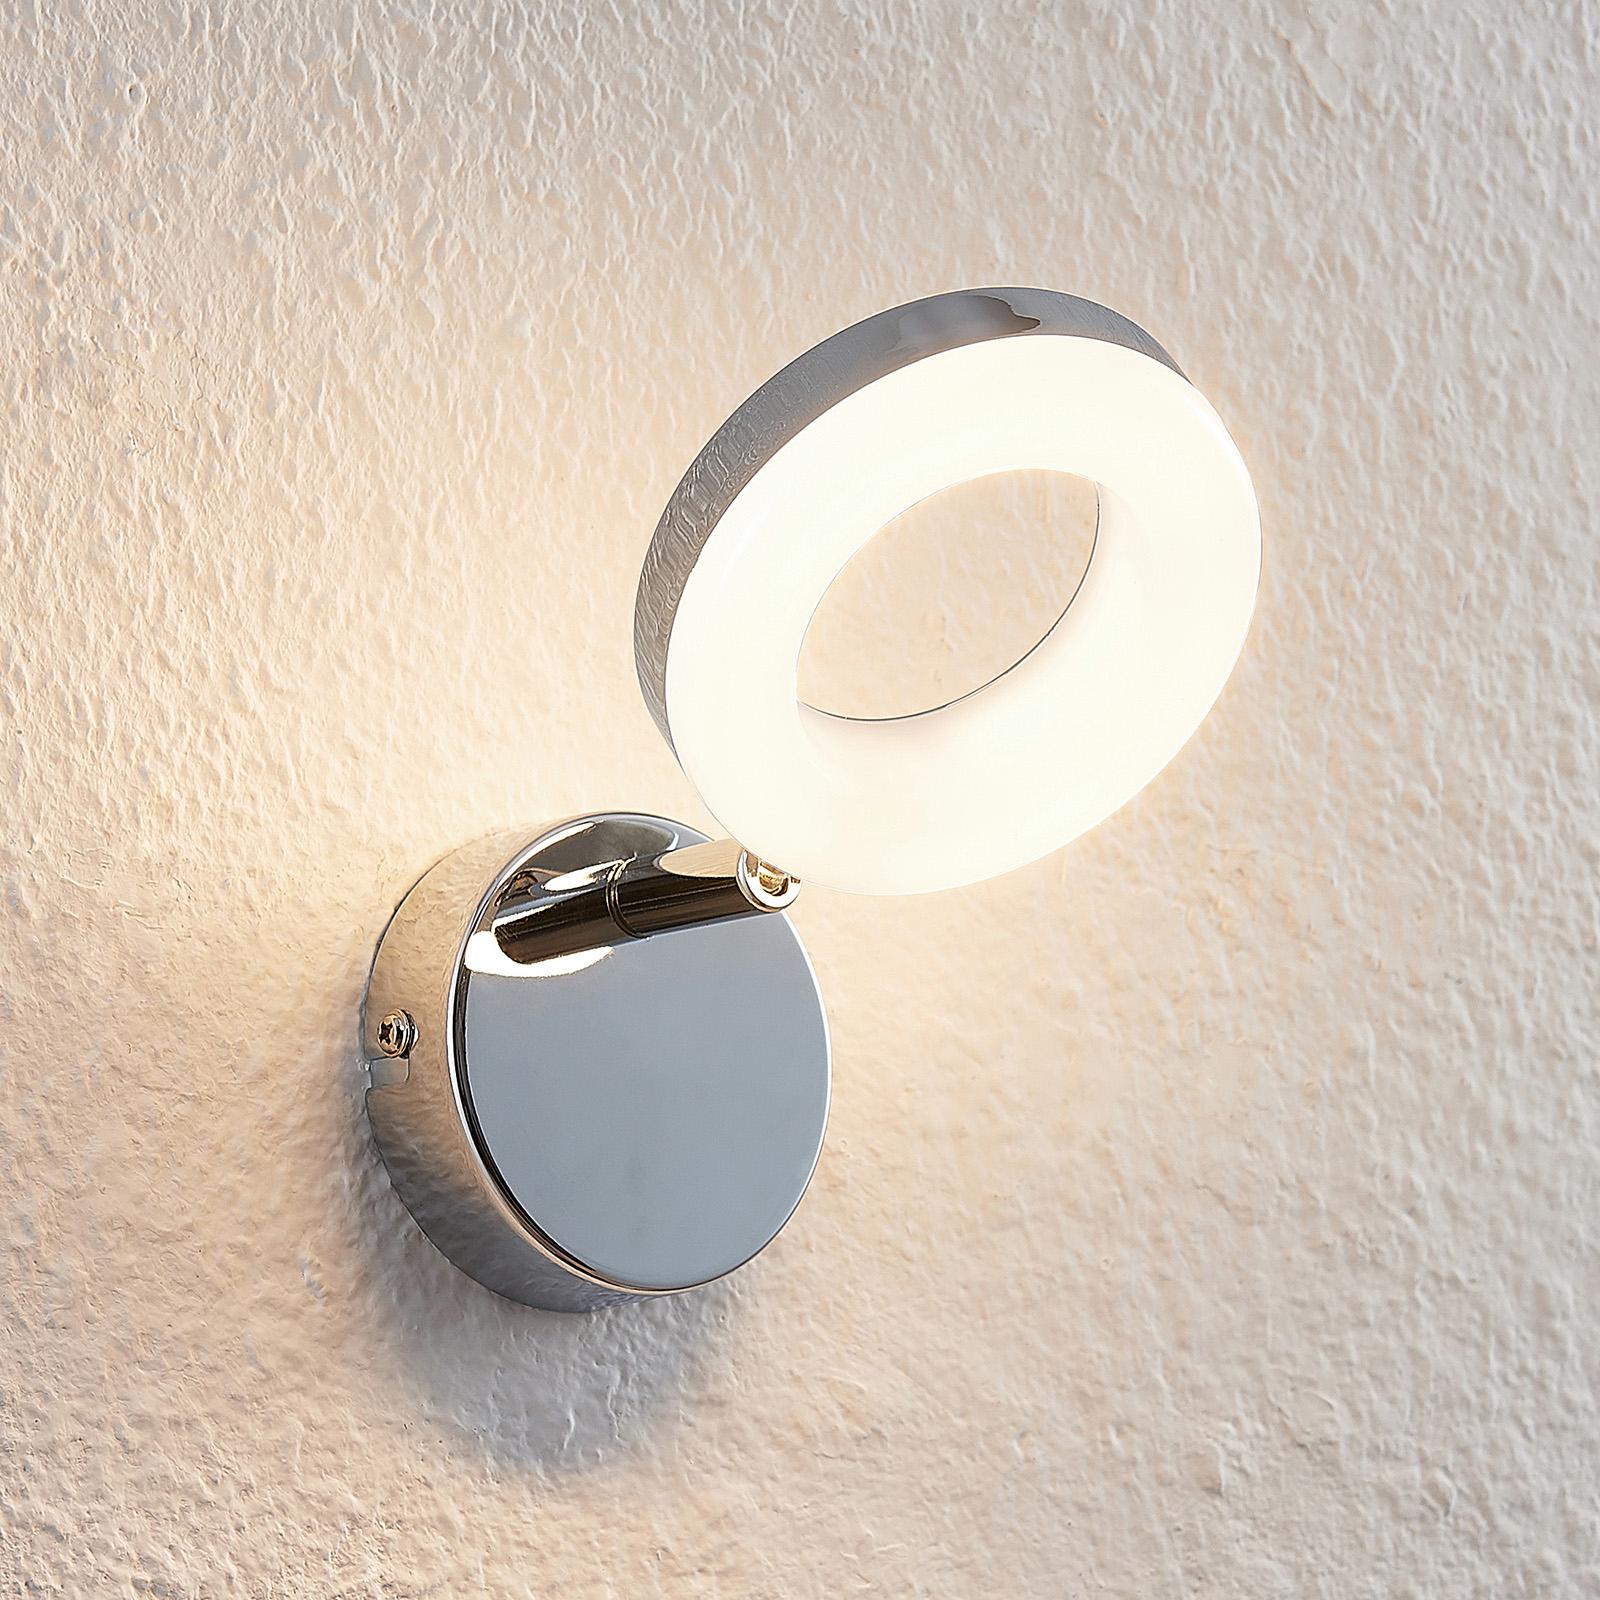 ELC Tioklia LED-Spot, chrom, einflammig